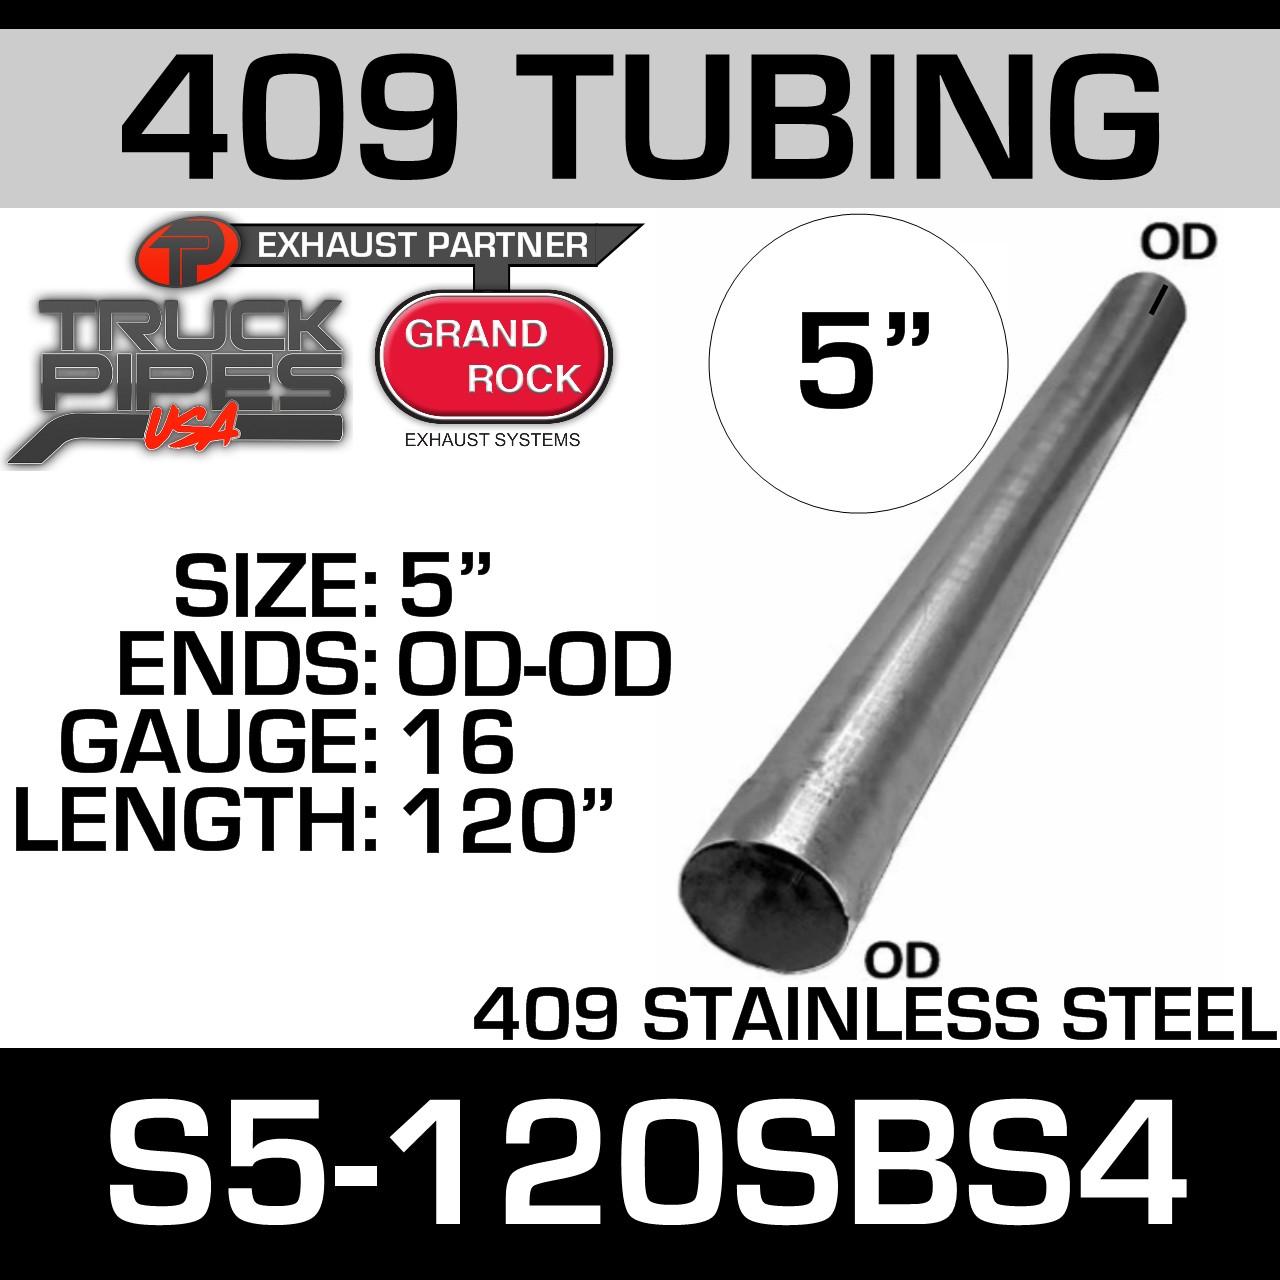 s5-120sbs4-409-steel-exhaust-tubing-5-inch-diameter-od-end-120-inches-long.jpg